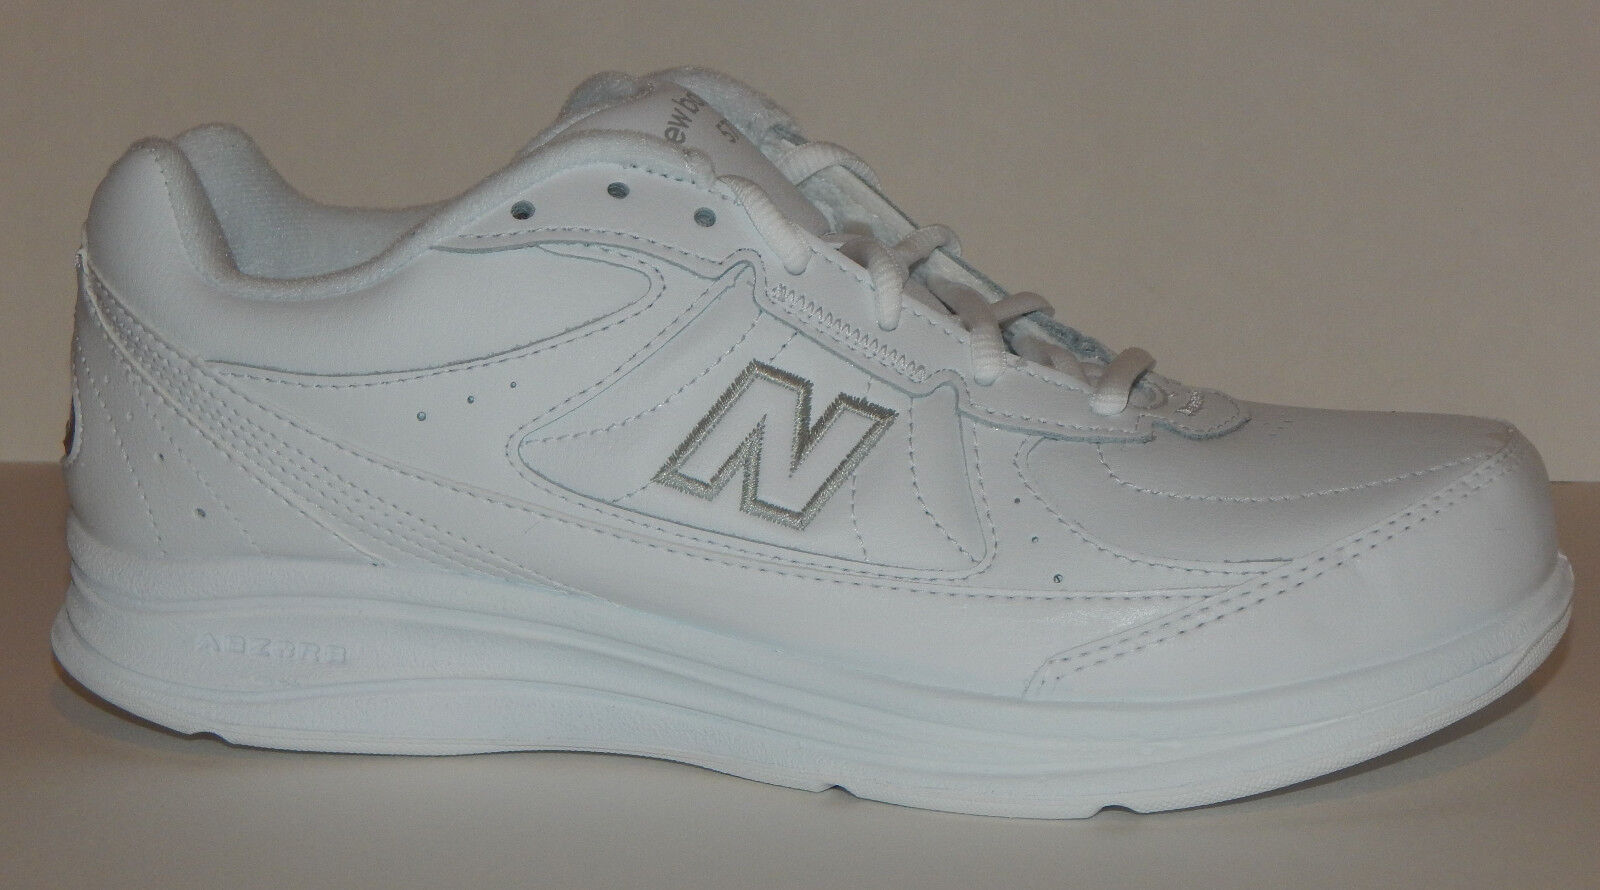 Para Hombre Negro Zapato Negro Hombre césped Stud New Balance totalmente NEW MU950LK2 75d665